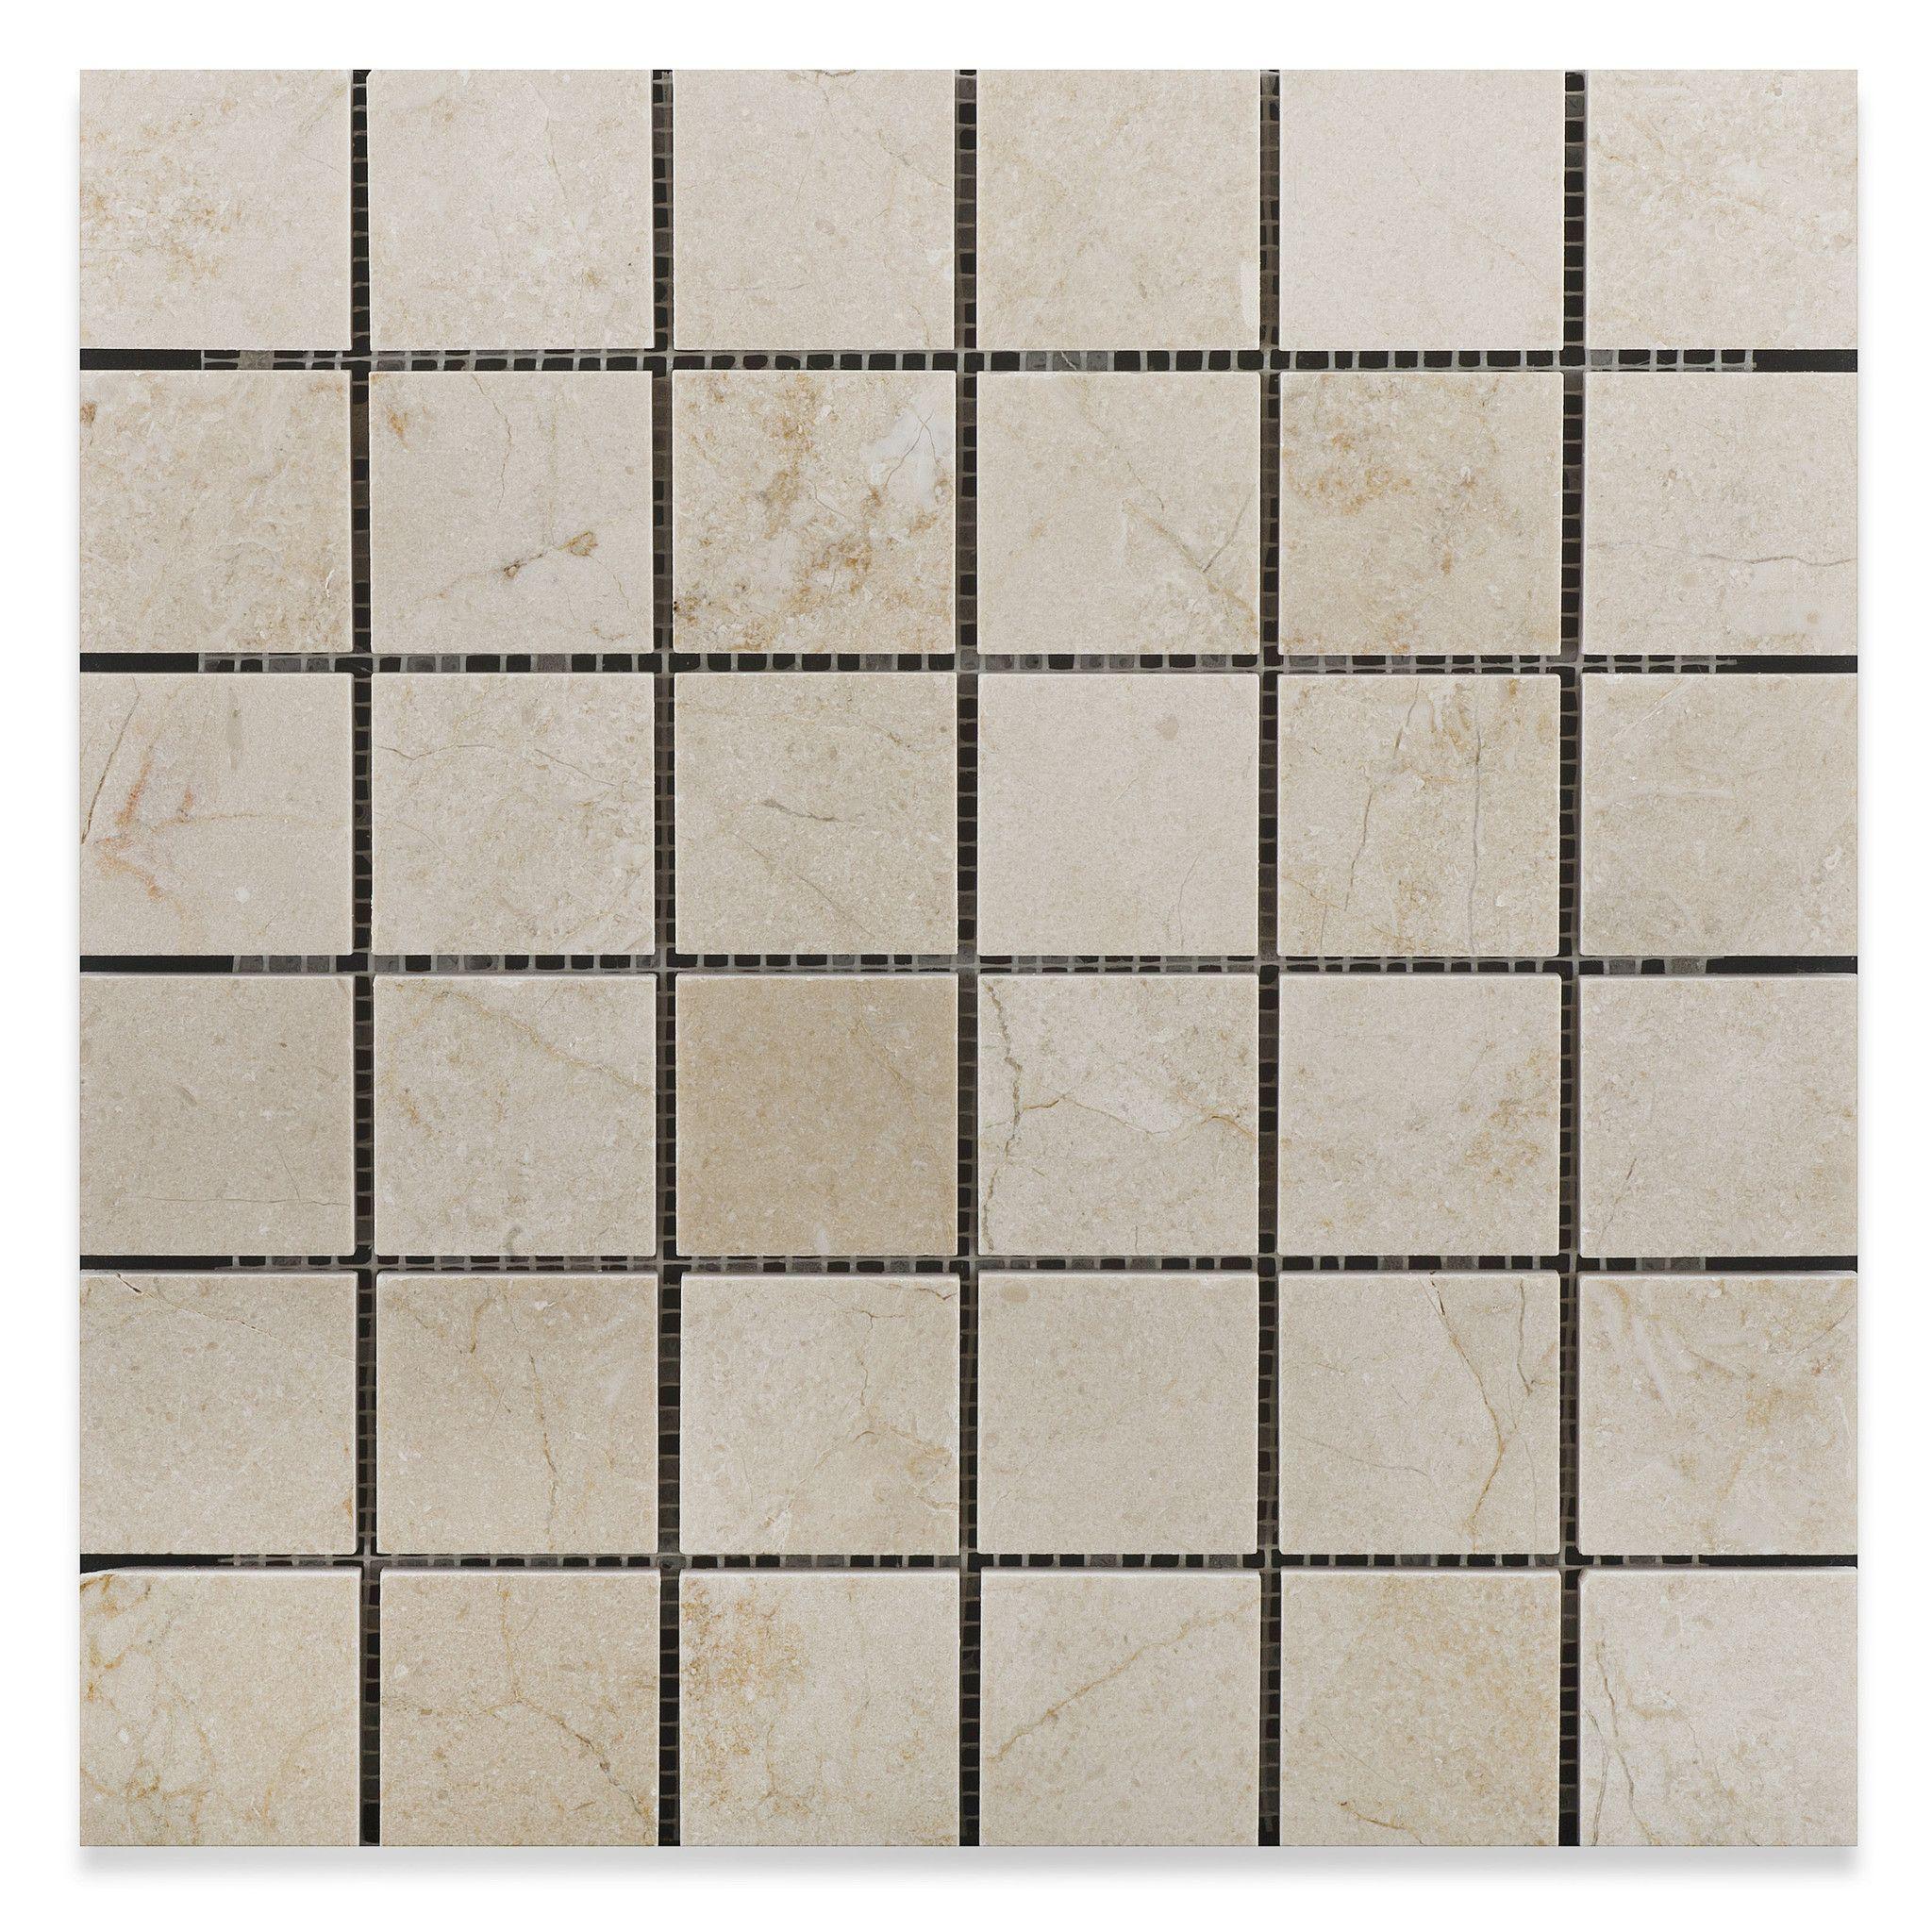 2 X 2 Crema Marfil Marble Polished Mosaic Tile Marble Polishing Mosaic Tiles Tile Samples